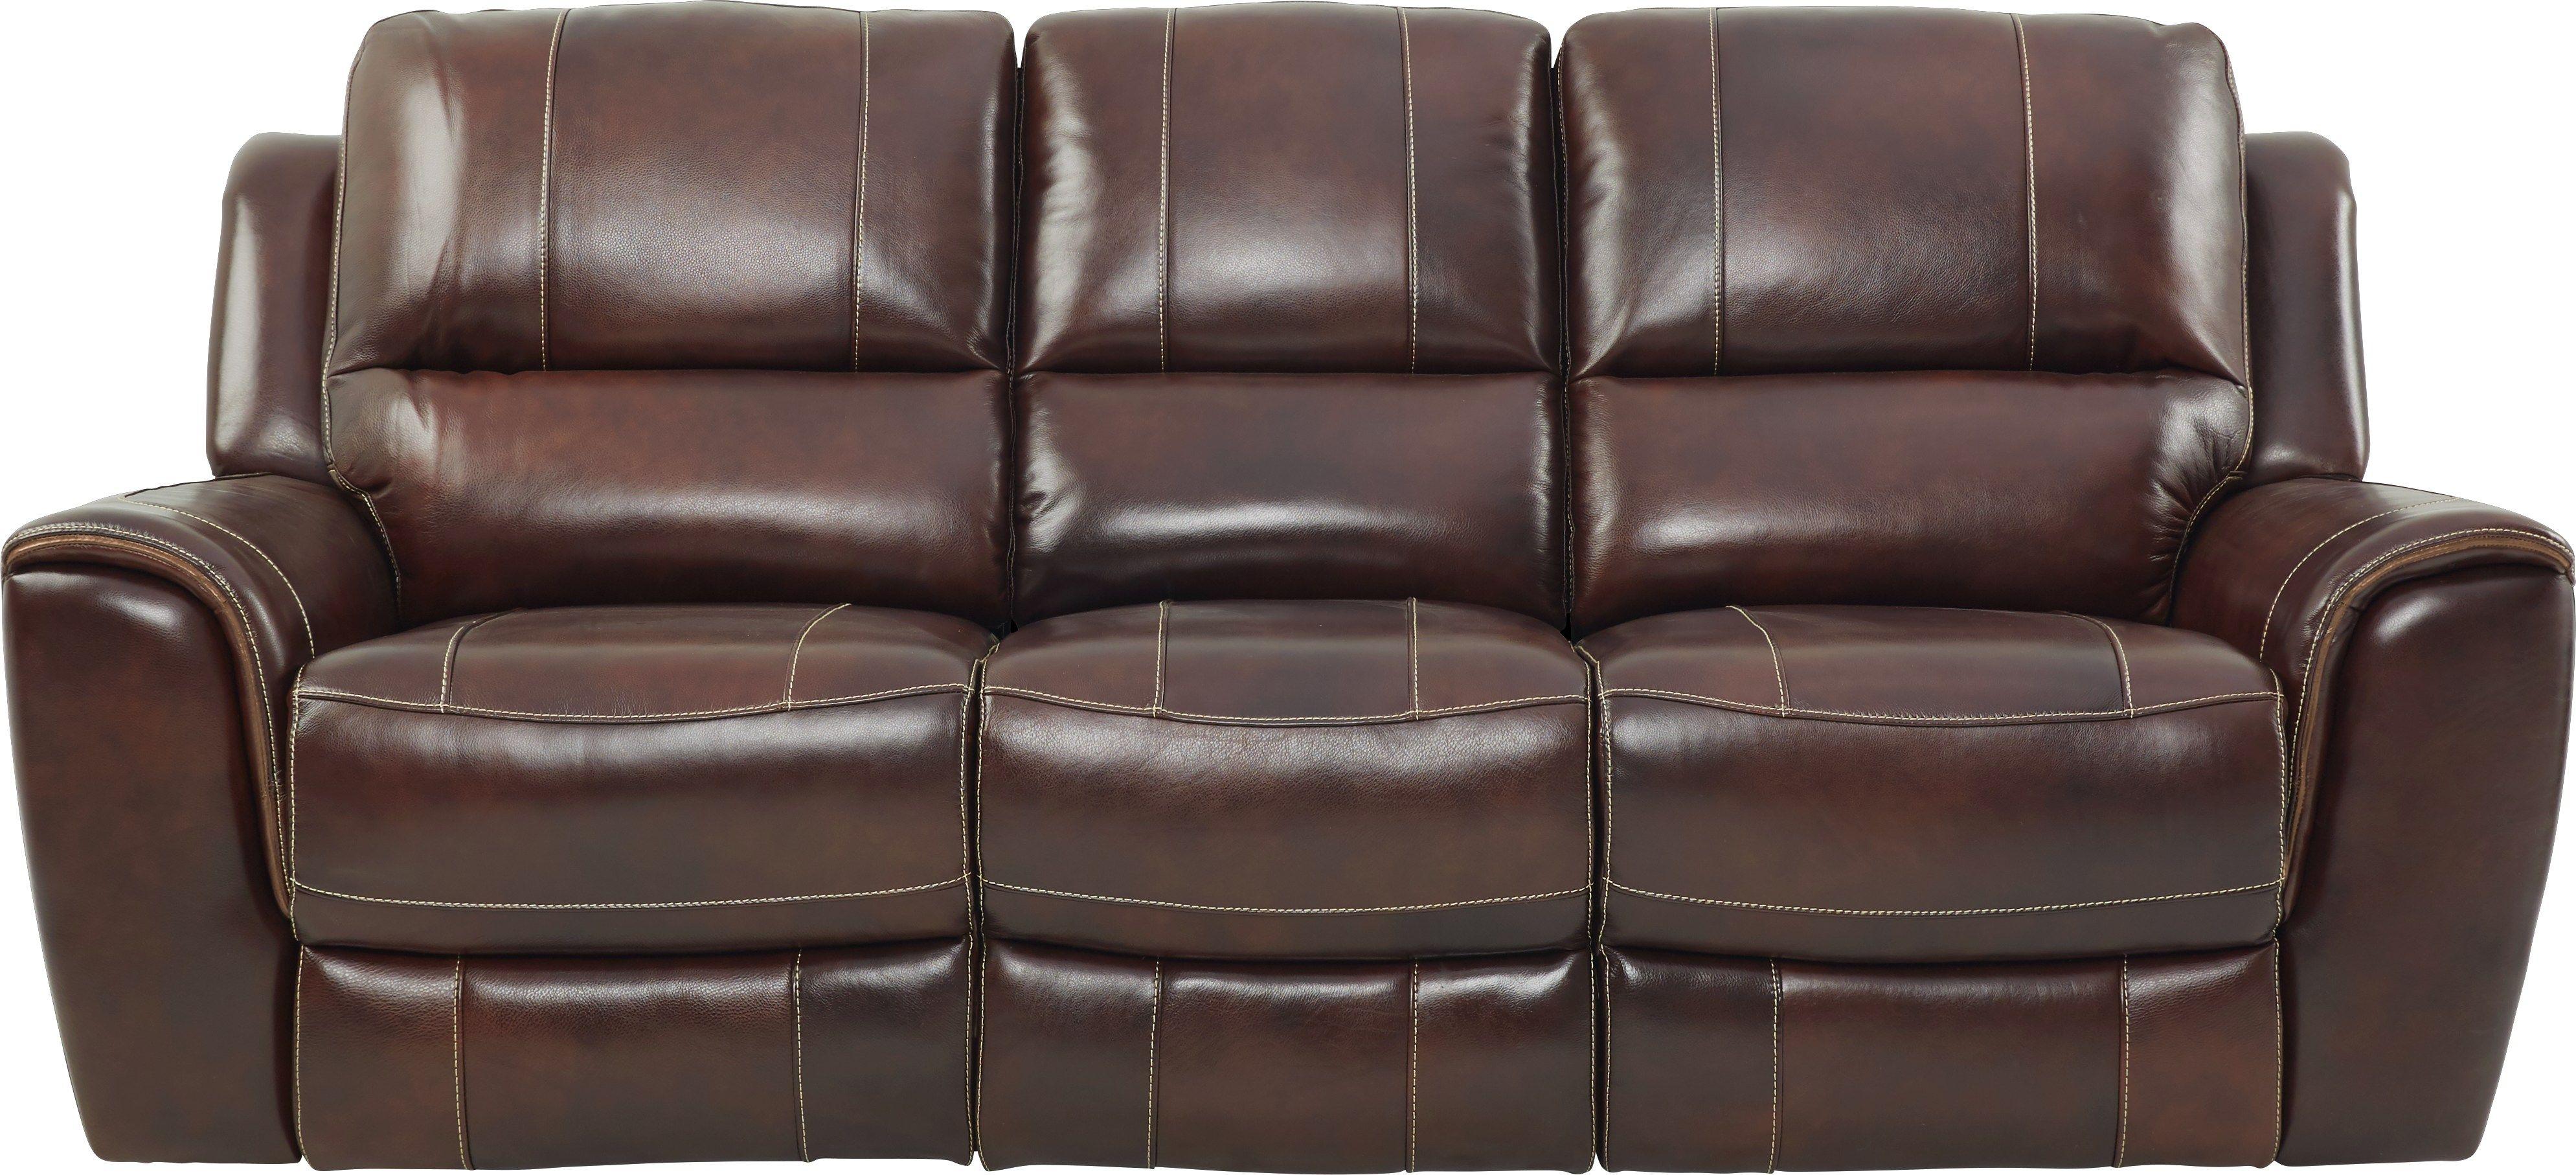 Enjoyable Lanzo Merlot Leather Reclining Sofa In 2019 Leather Ibusinesslaw Wood Chair Design Ideas Ibusinesslaworg